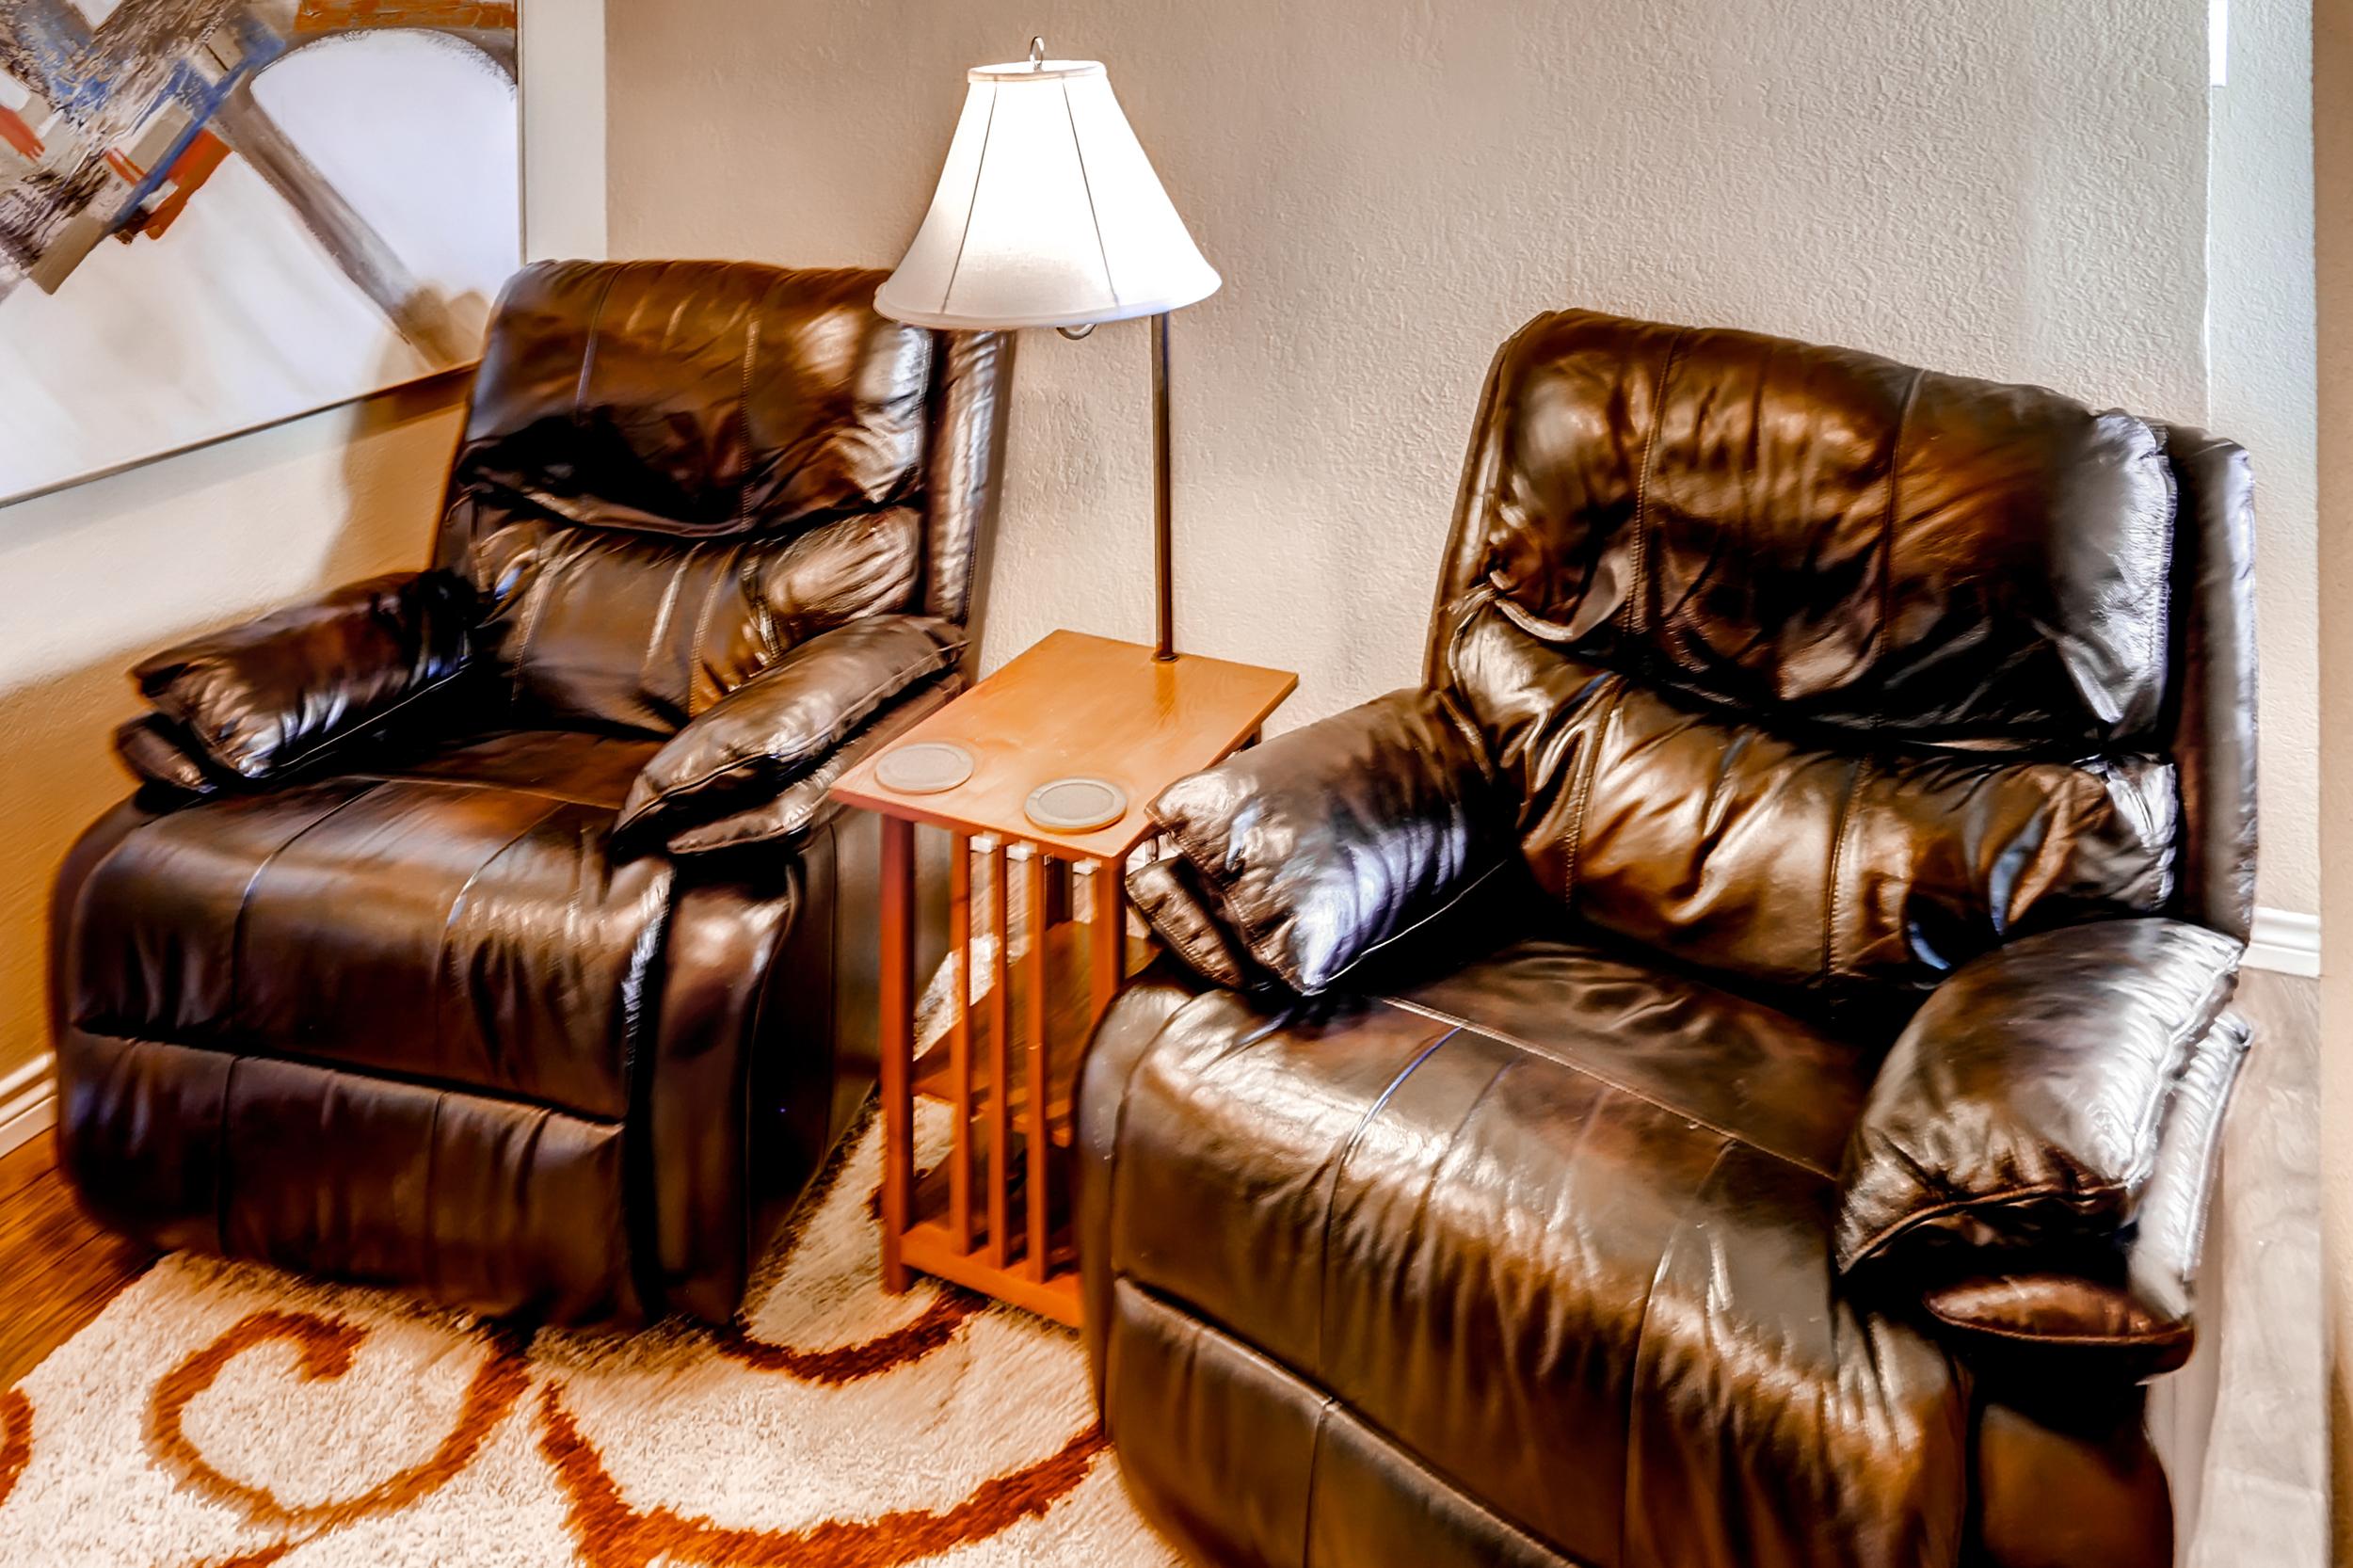 QuintilianiTamra - TV Room 4.jpg